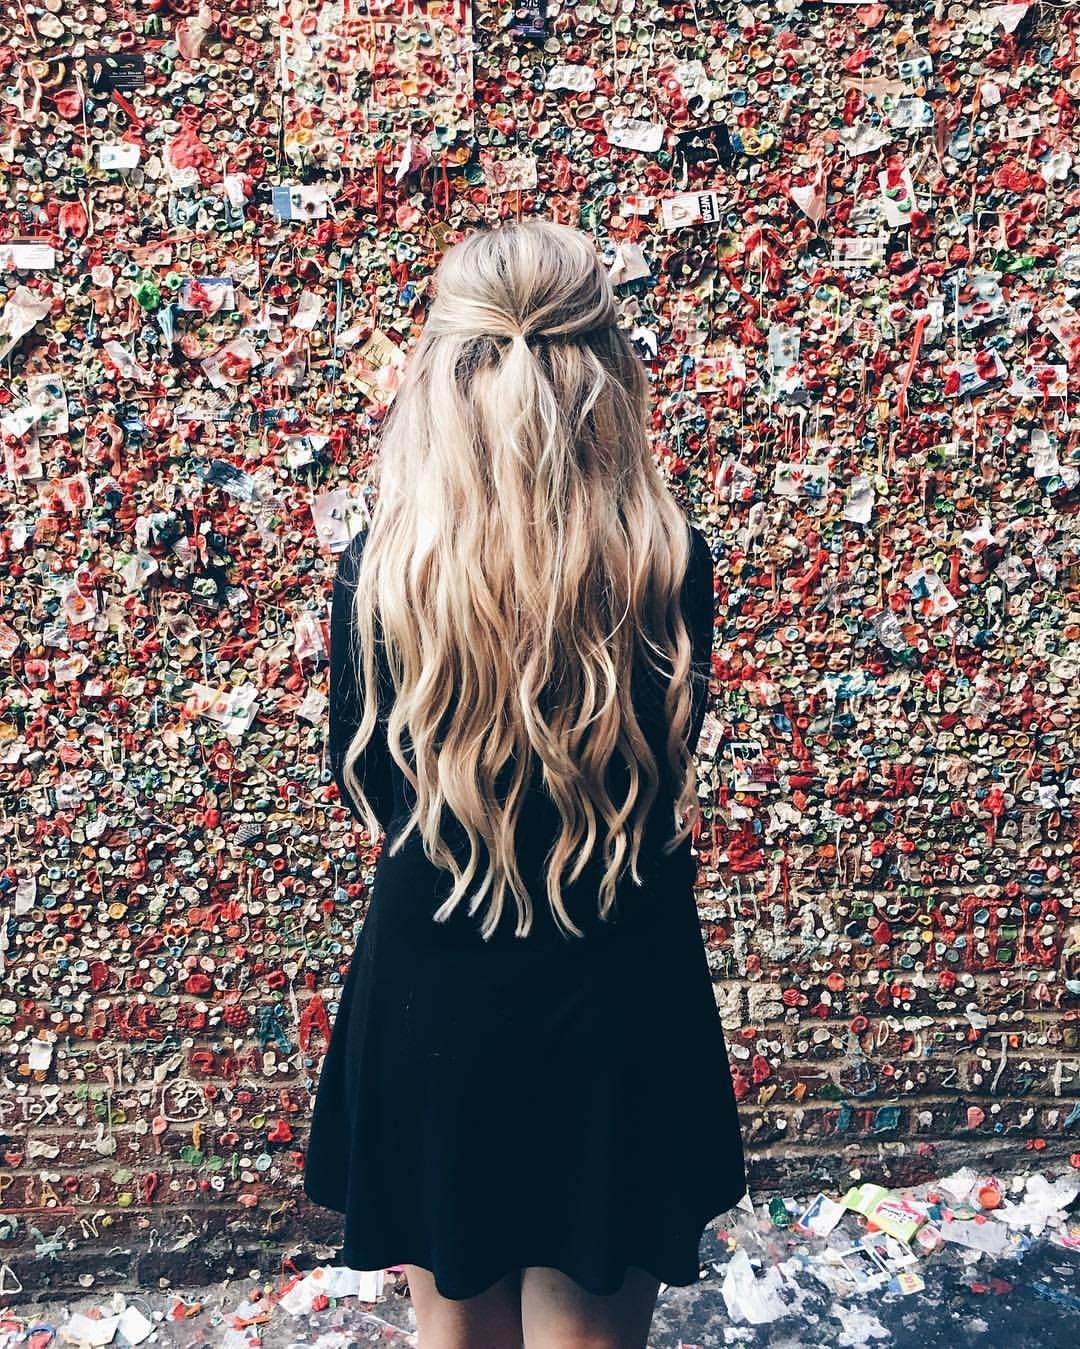 hair inspo tumblr - 736×919